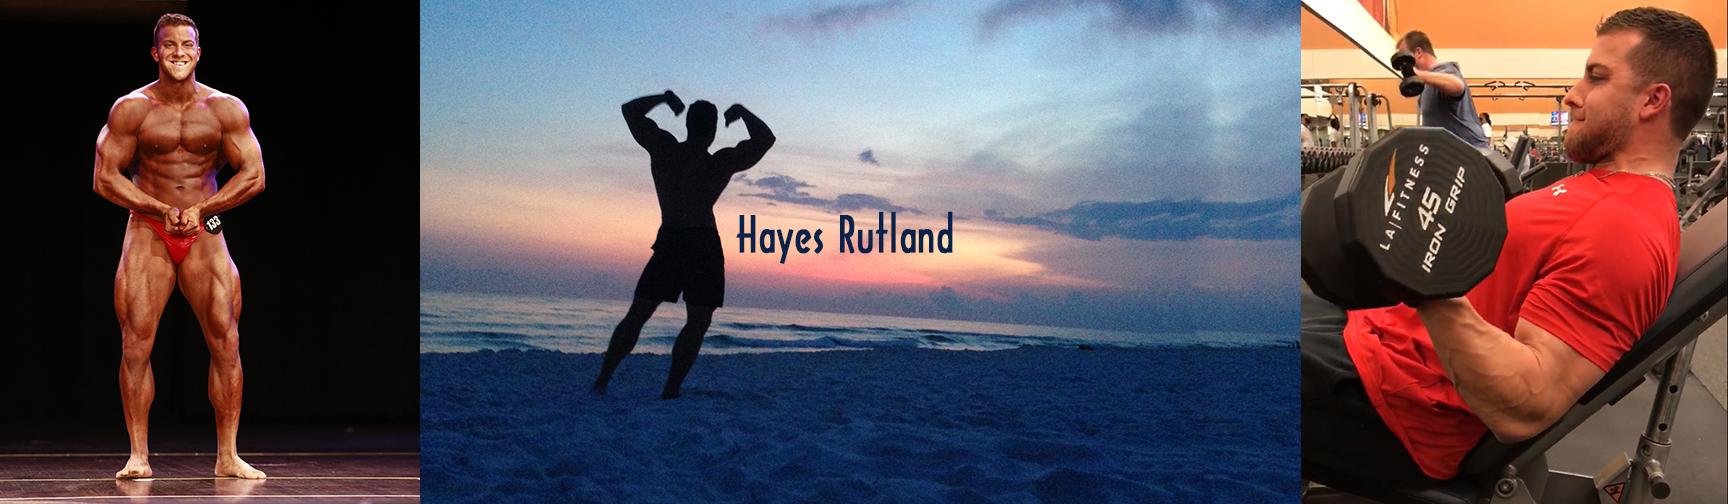 hayes-rutland-banner